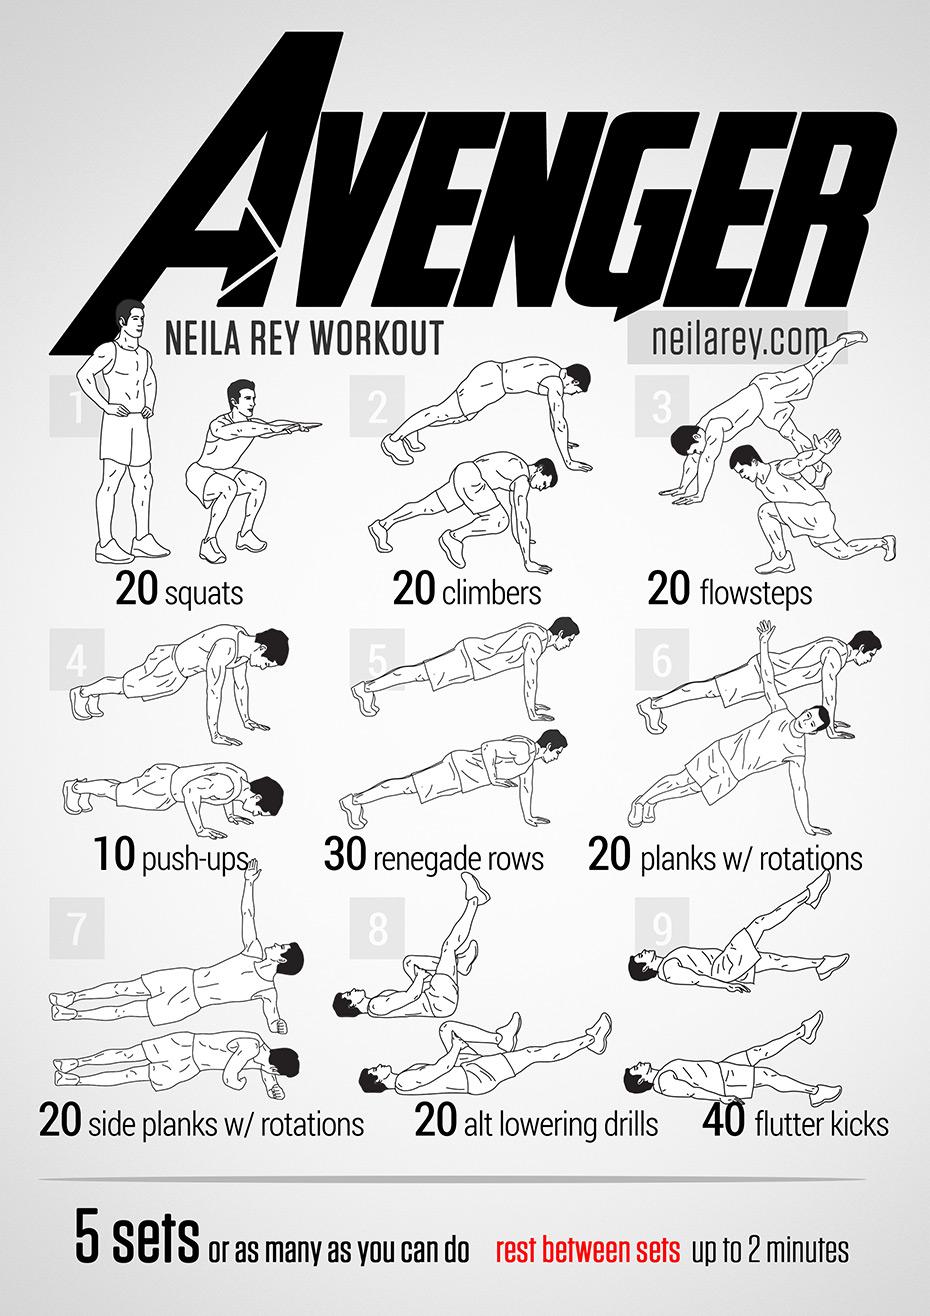 Avenger Workout